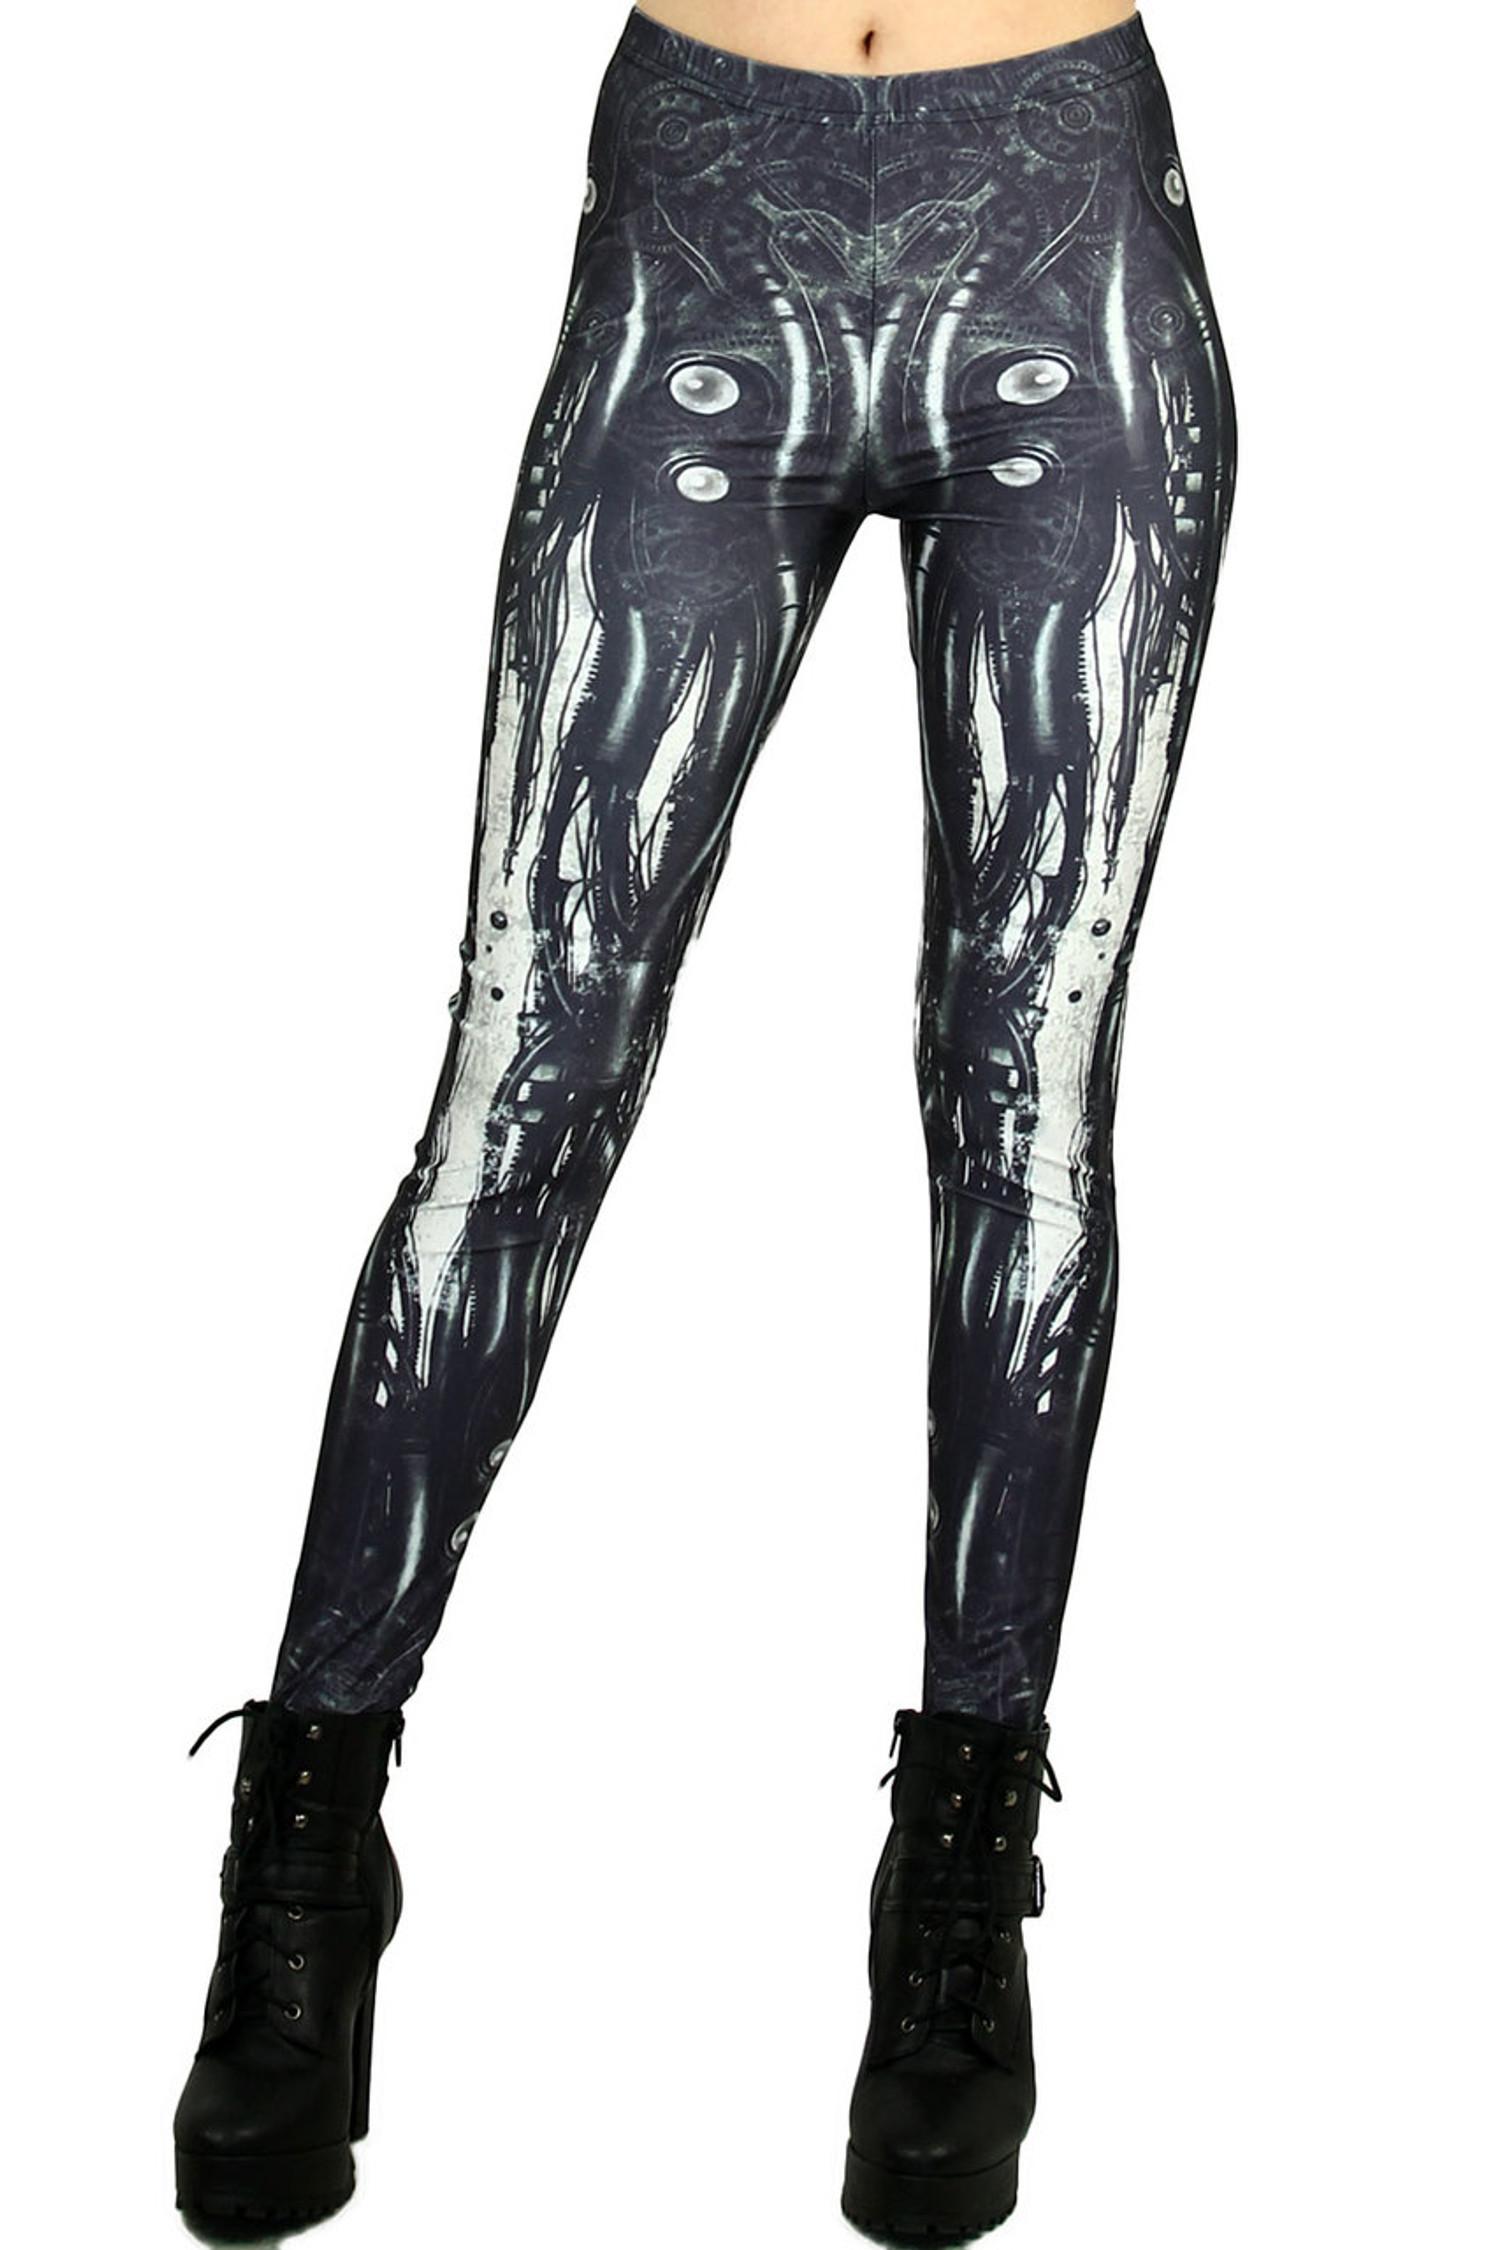 Steampunk Anatomy Leggings - Plus Size